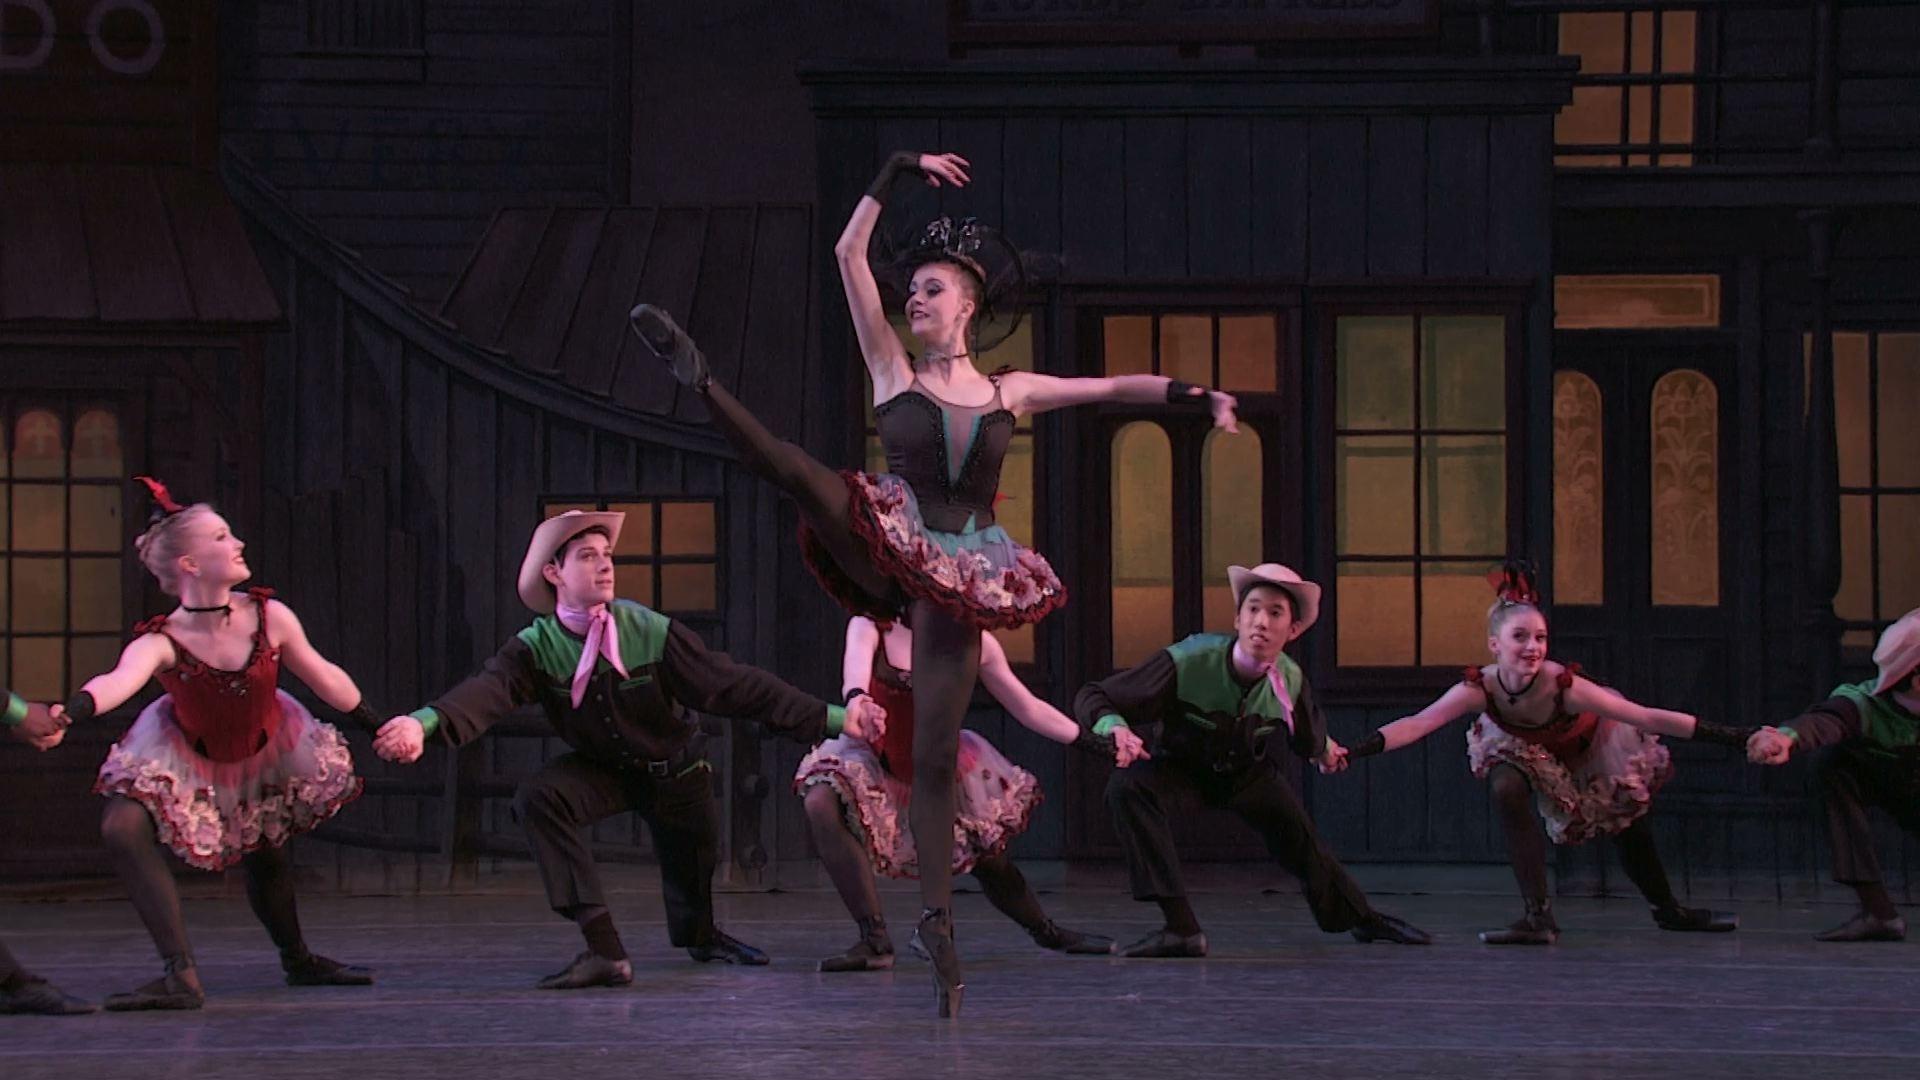 Смотреть brazzers school of ballet 23 фотография